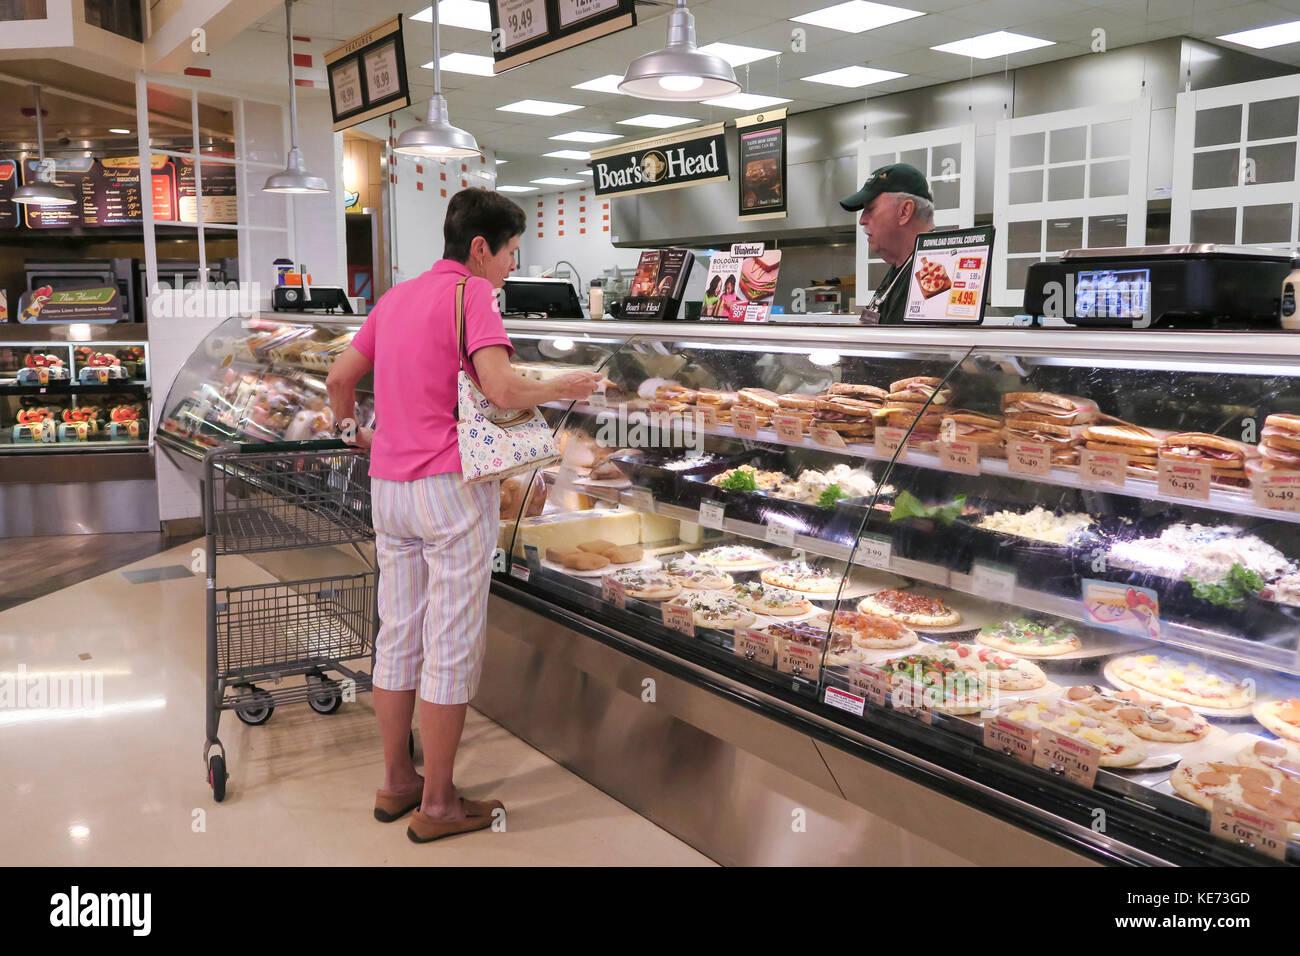 Whole Foods Market Czech Republic